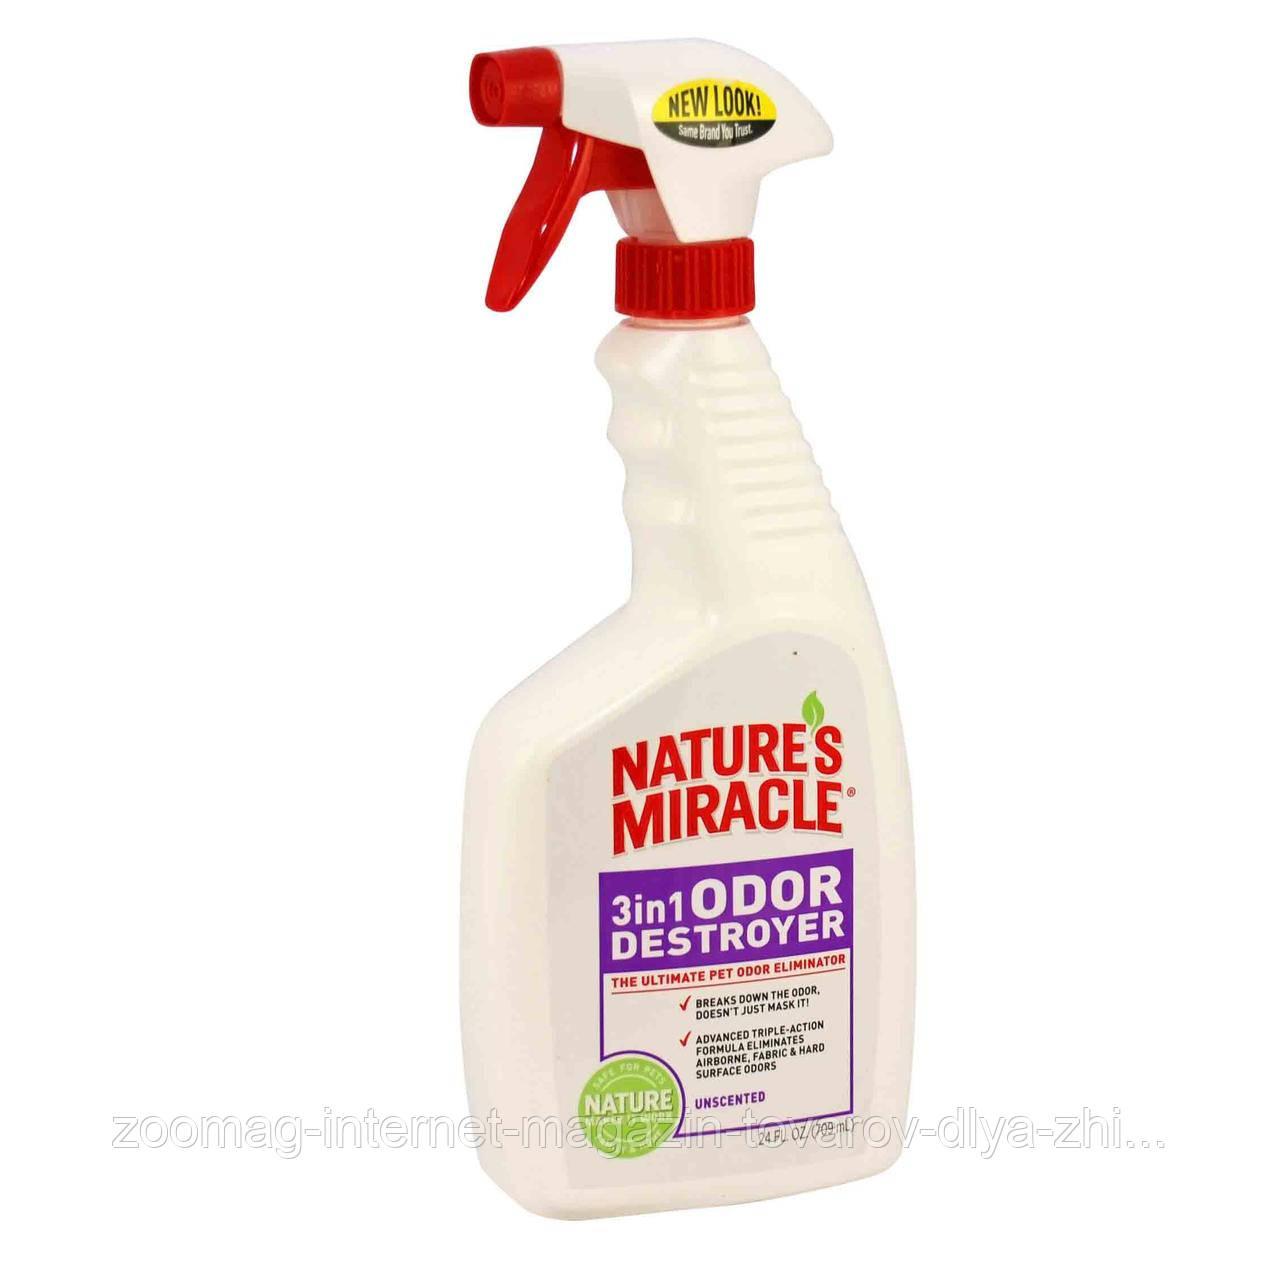 "Знищувач запахів тварин ""3in1 Odor Destroyer"" (спрей 710мл), 8in1 nature's Miracle®"